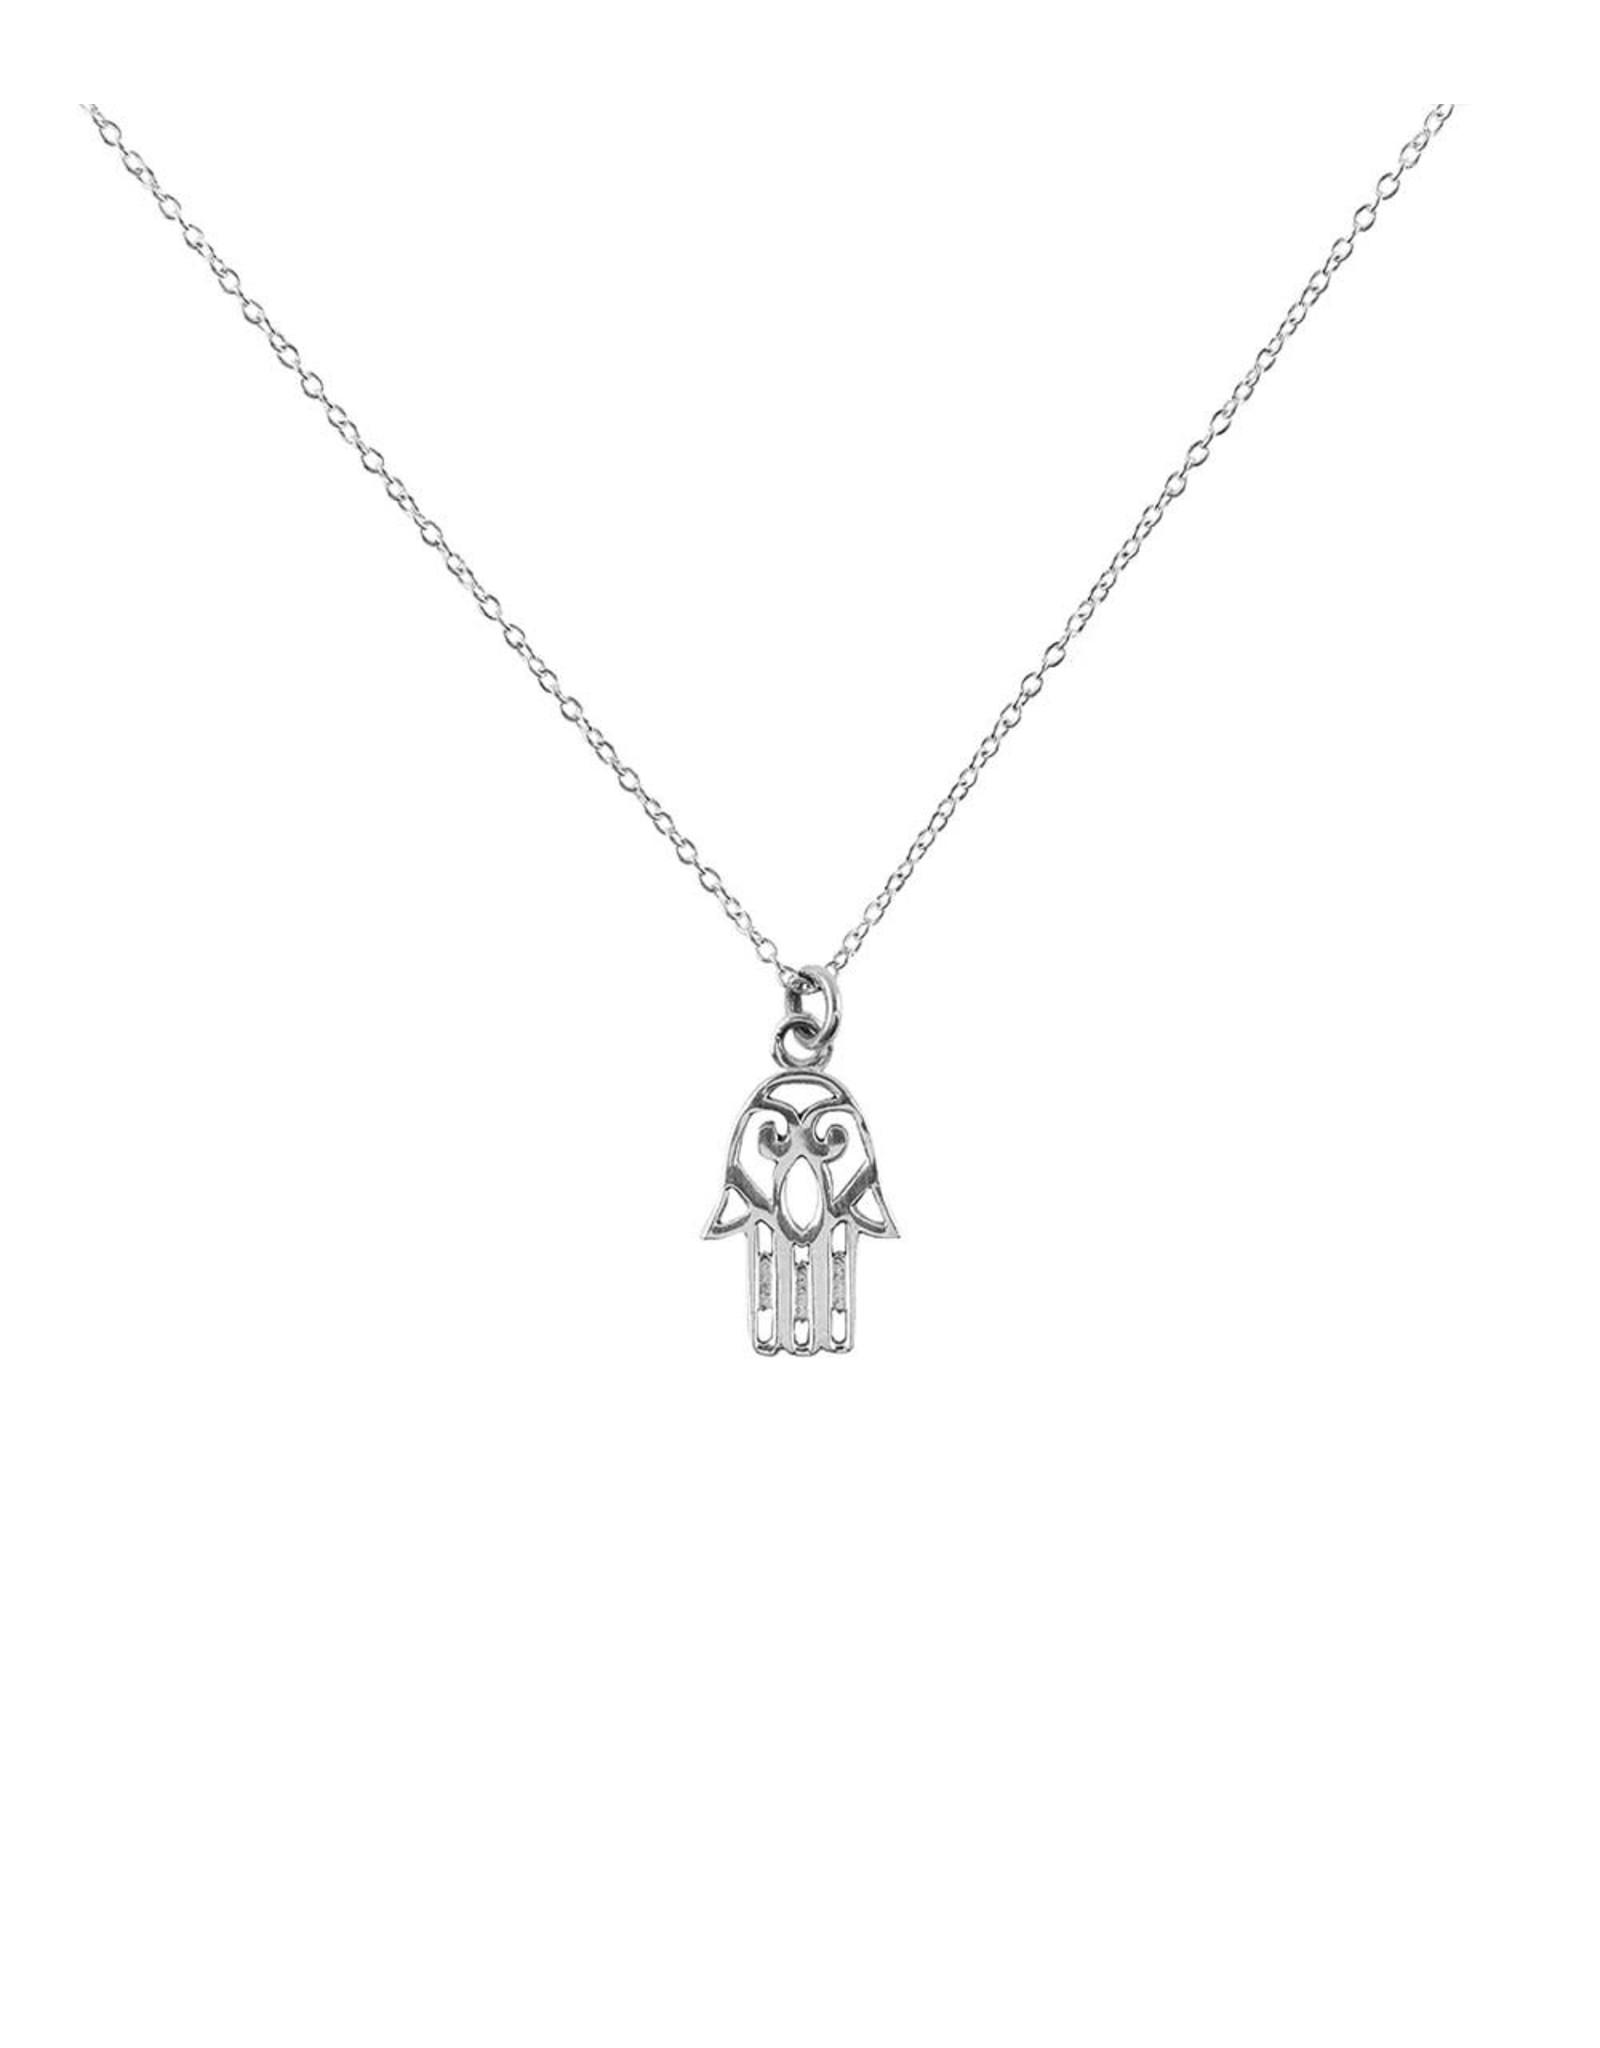 Sterling Silver Charm Hamsa Necklace